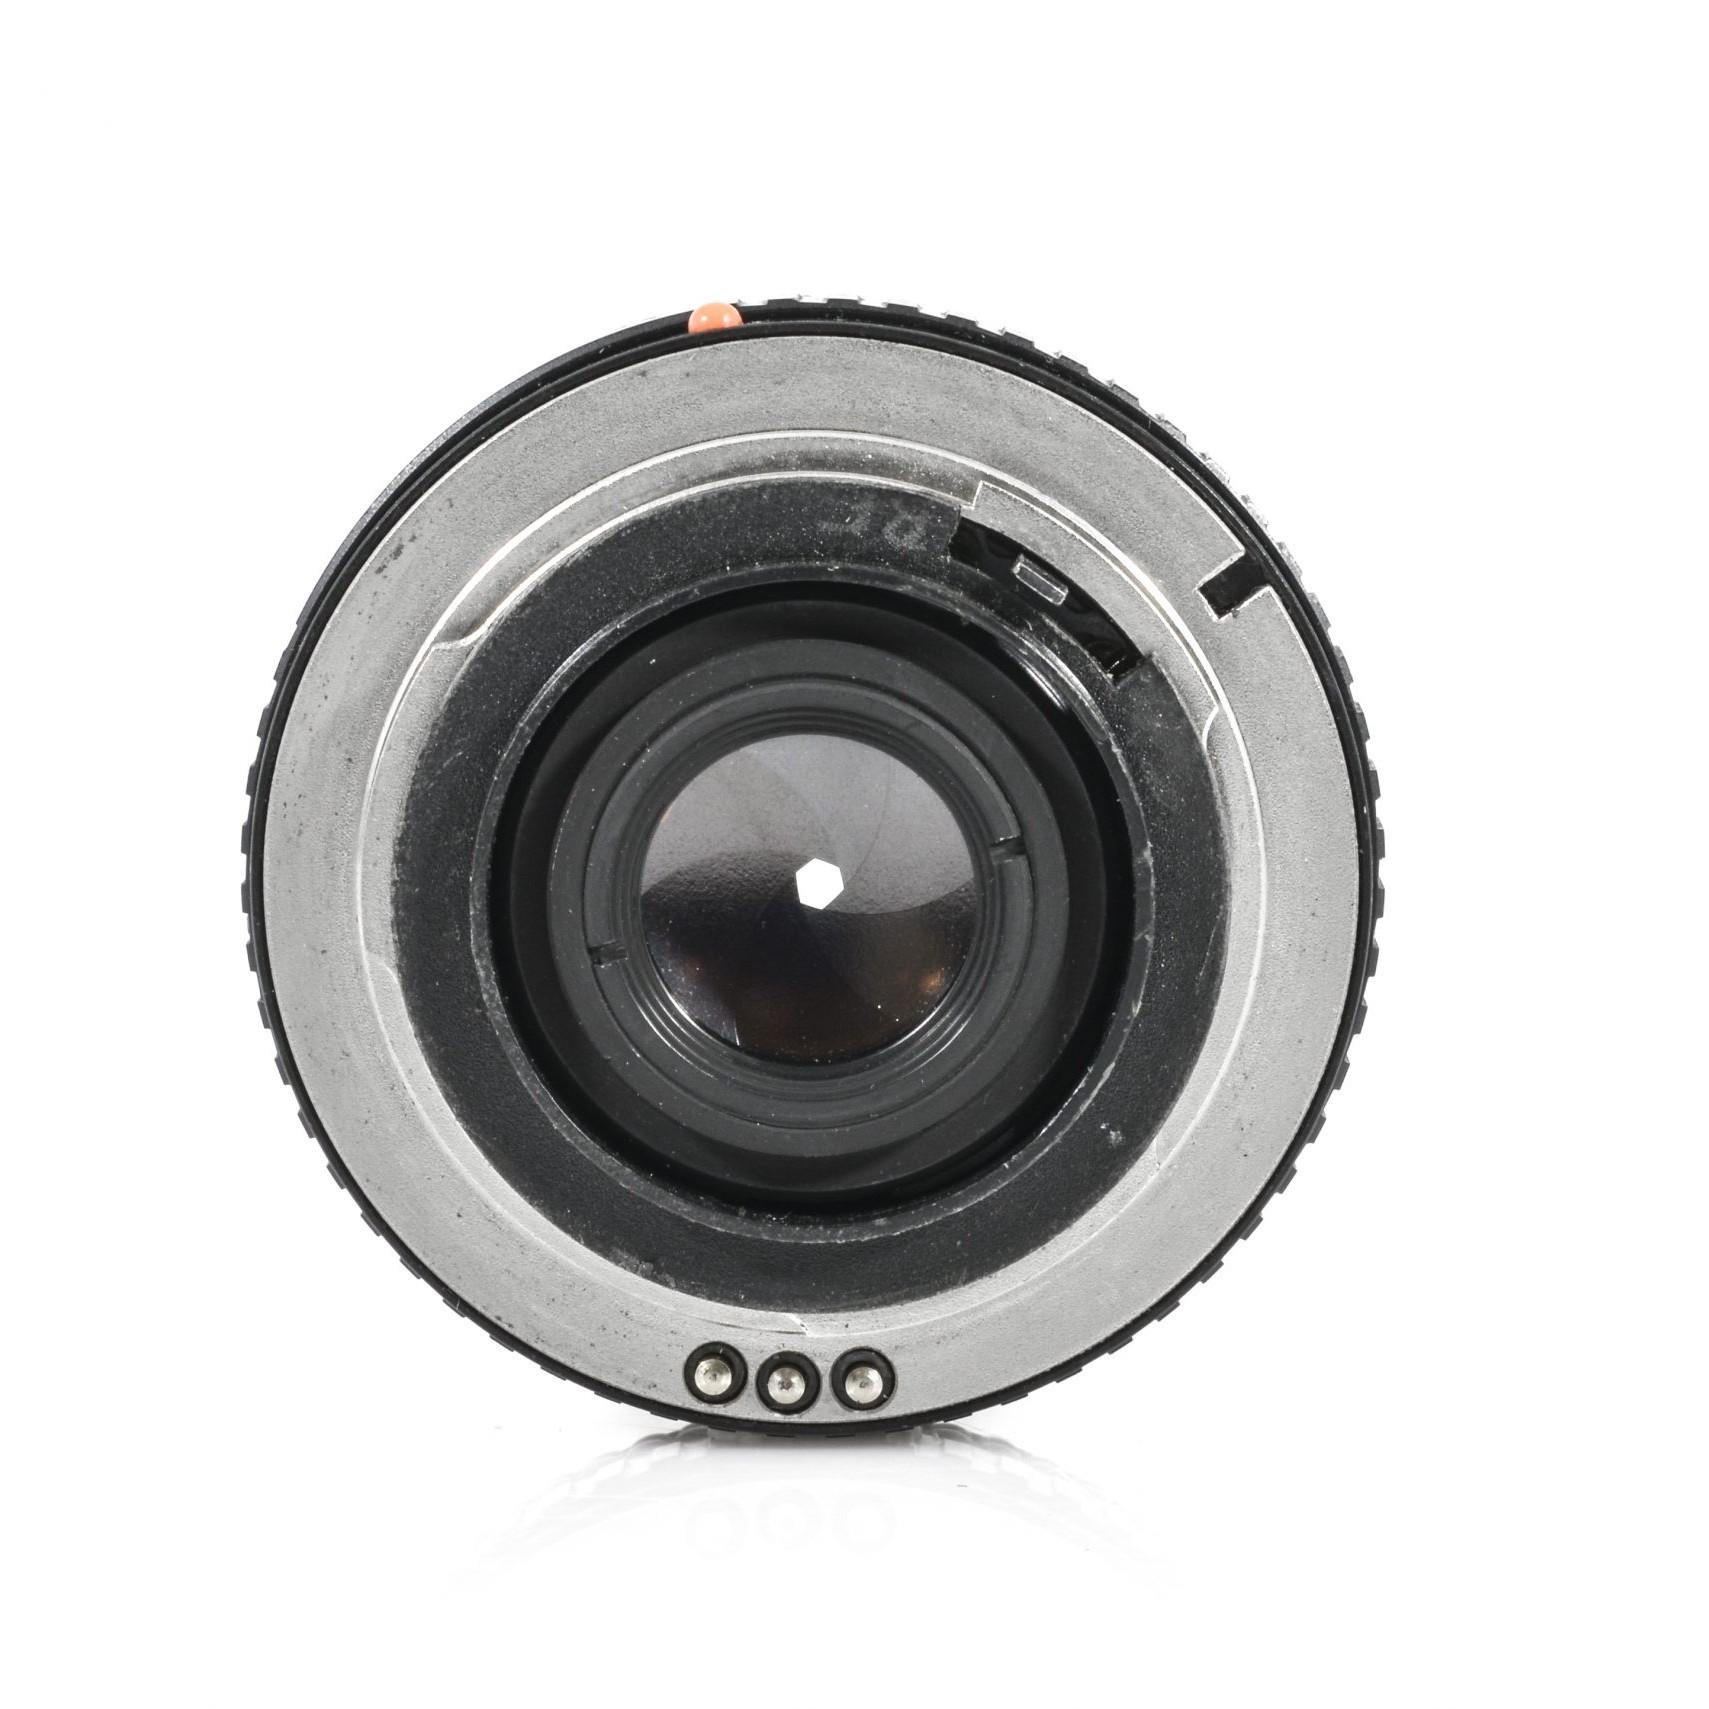 Praktica Pentacon MC F2.4 50mm Lens the south west collective of photography